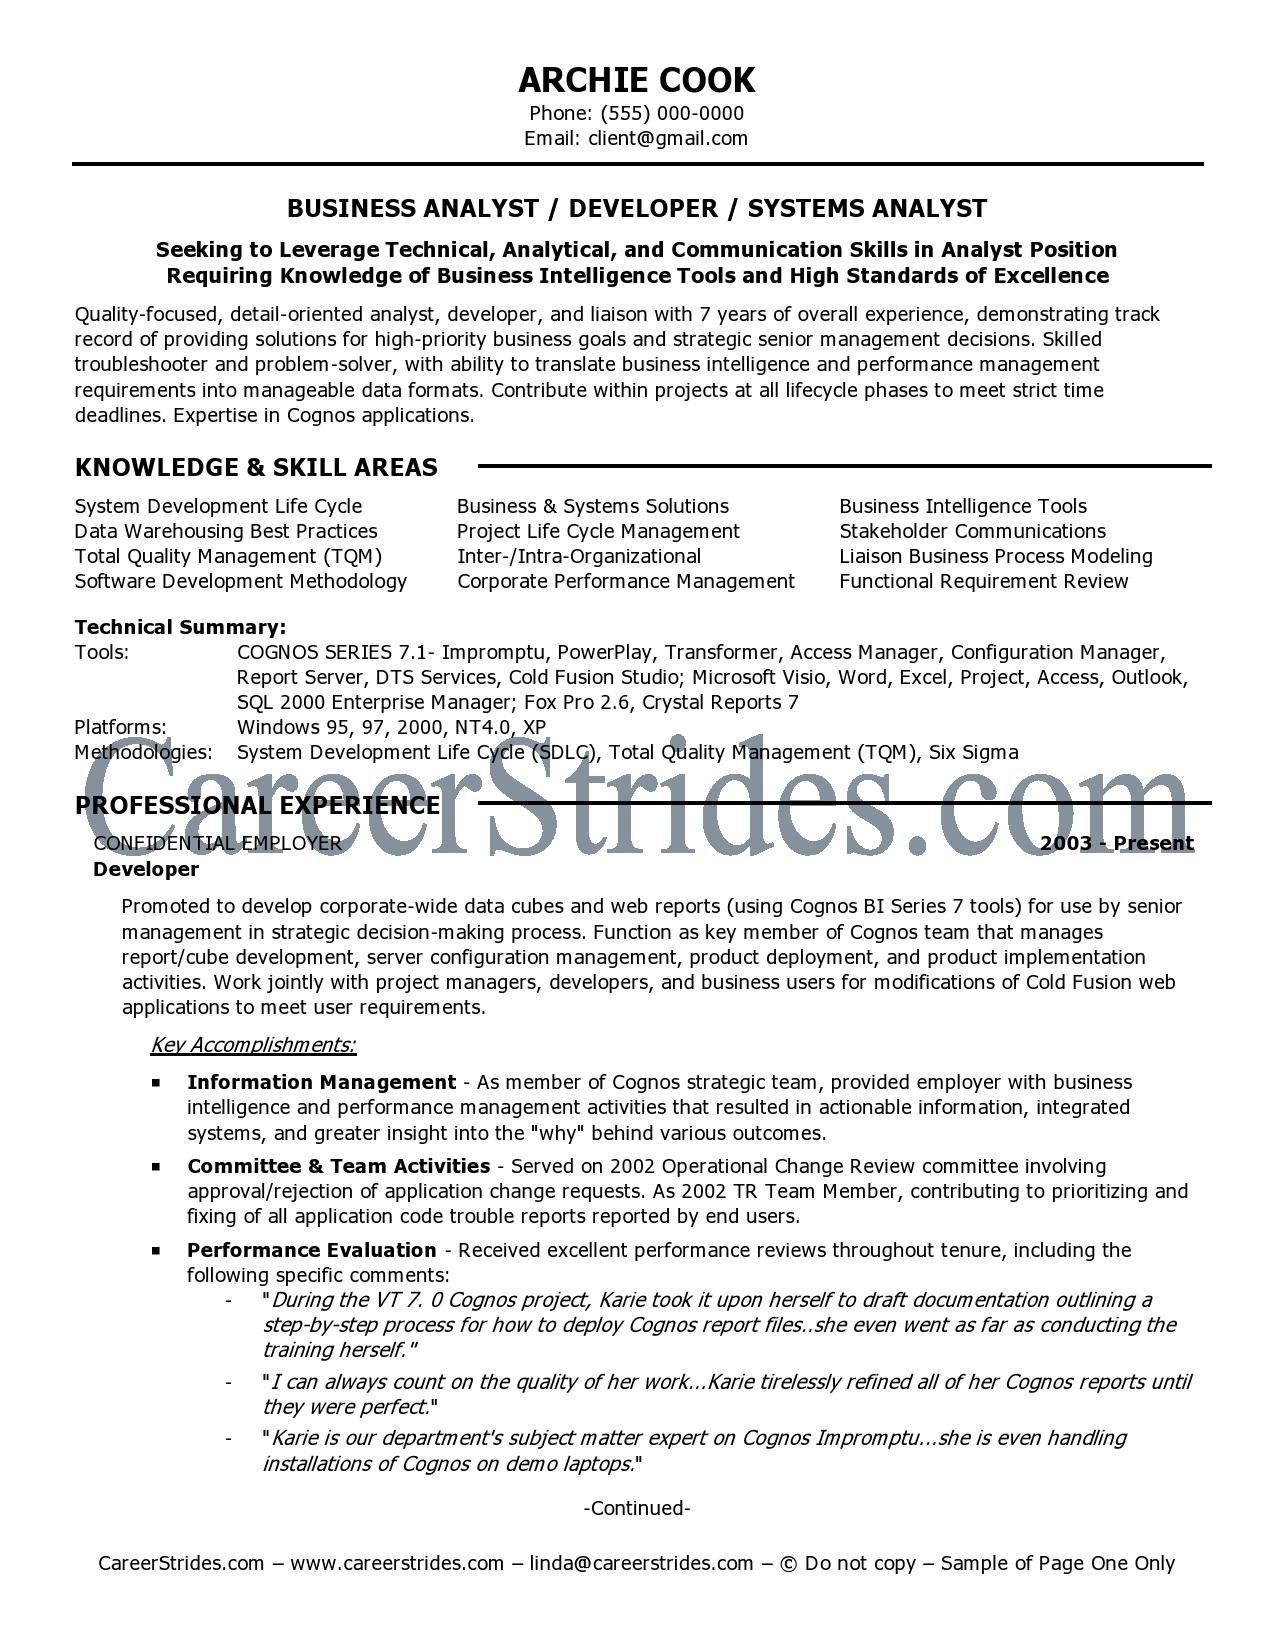 sas business analyst resume sample resume and cover letter sas business analyst resume sample sas global certification program data analyst resume sample best resumes it